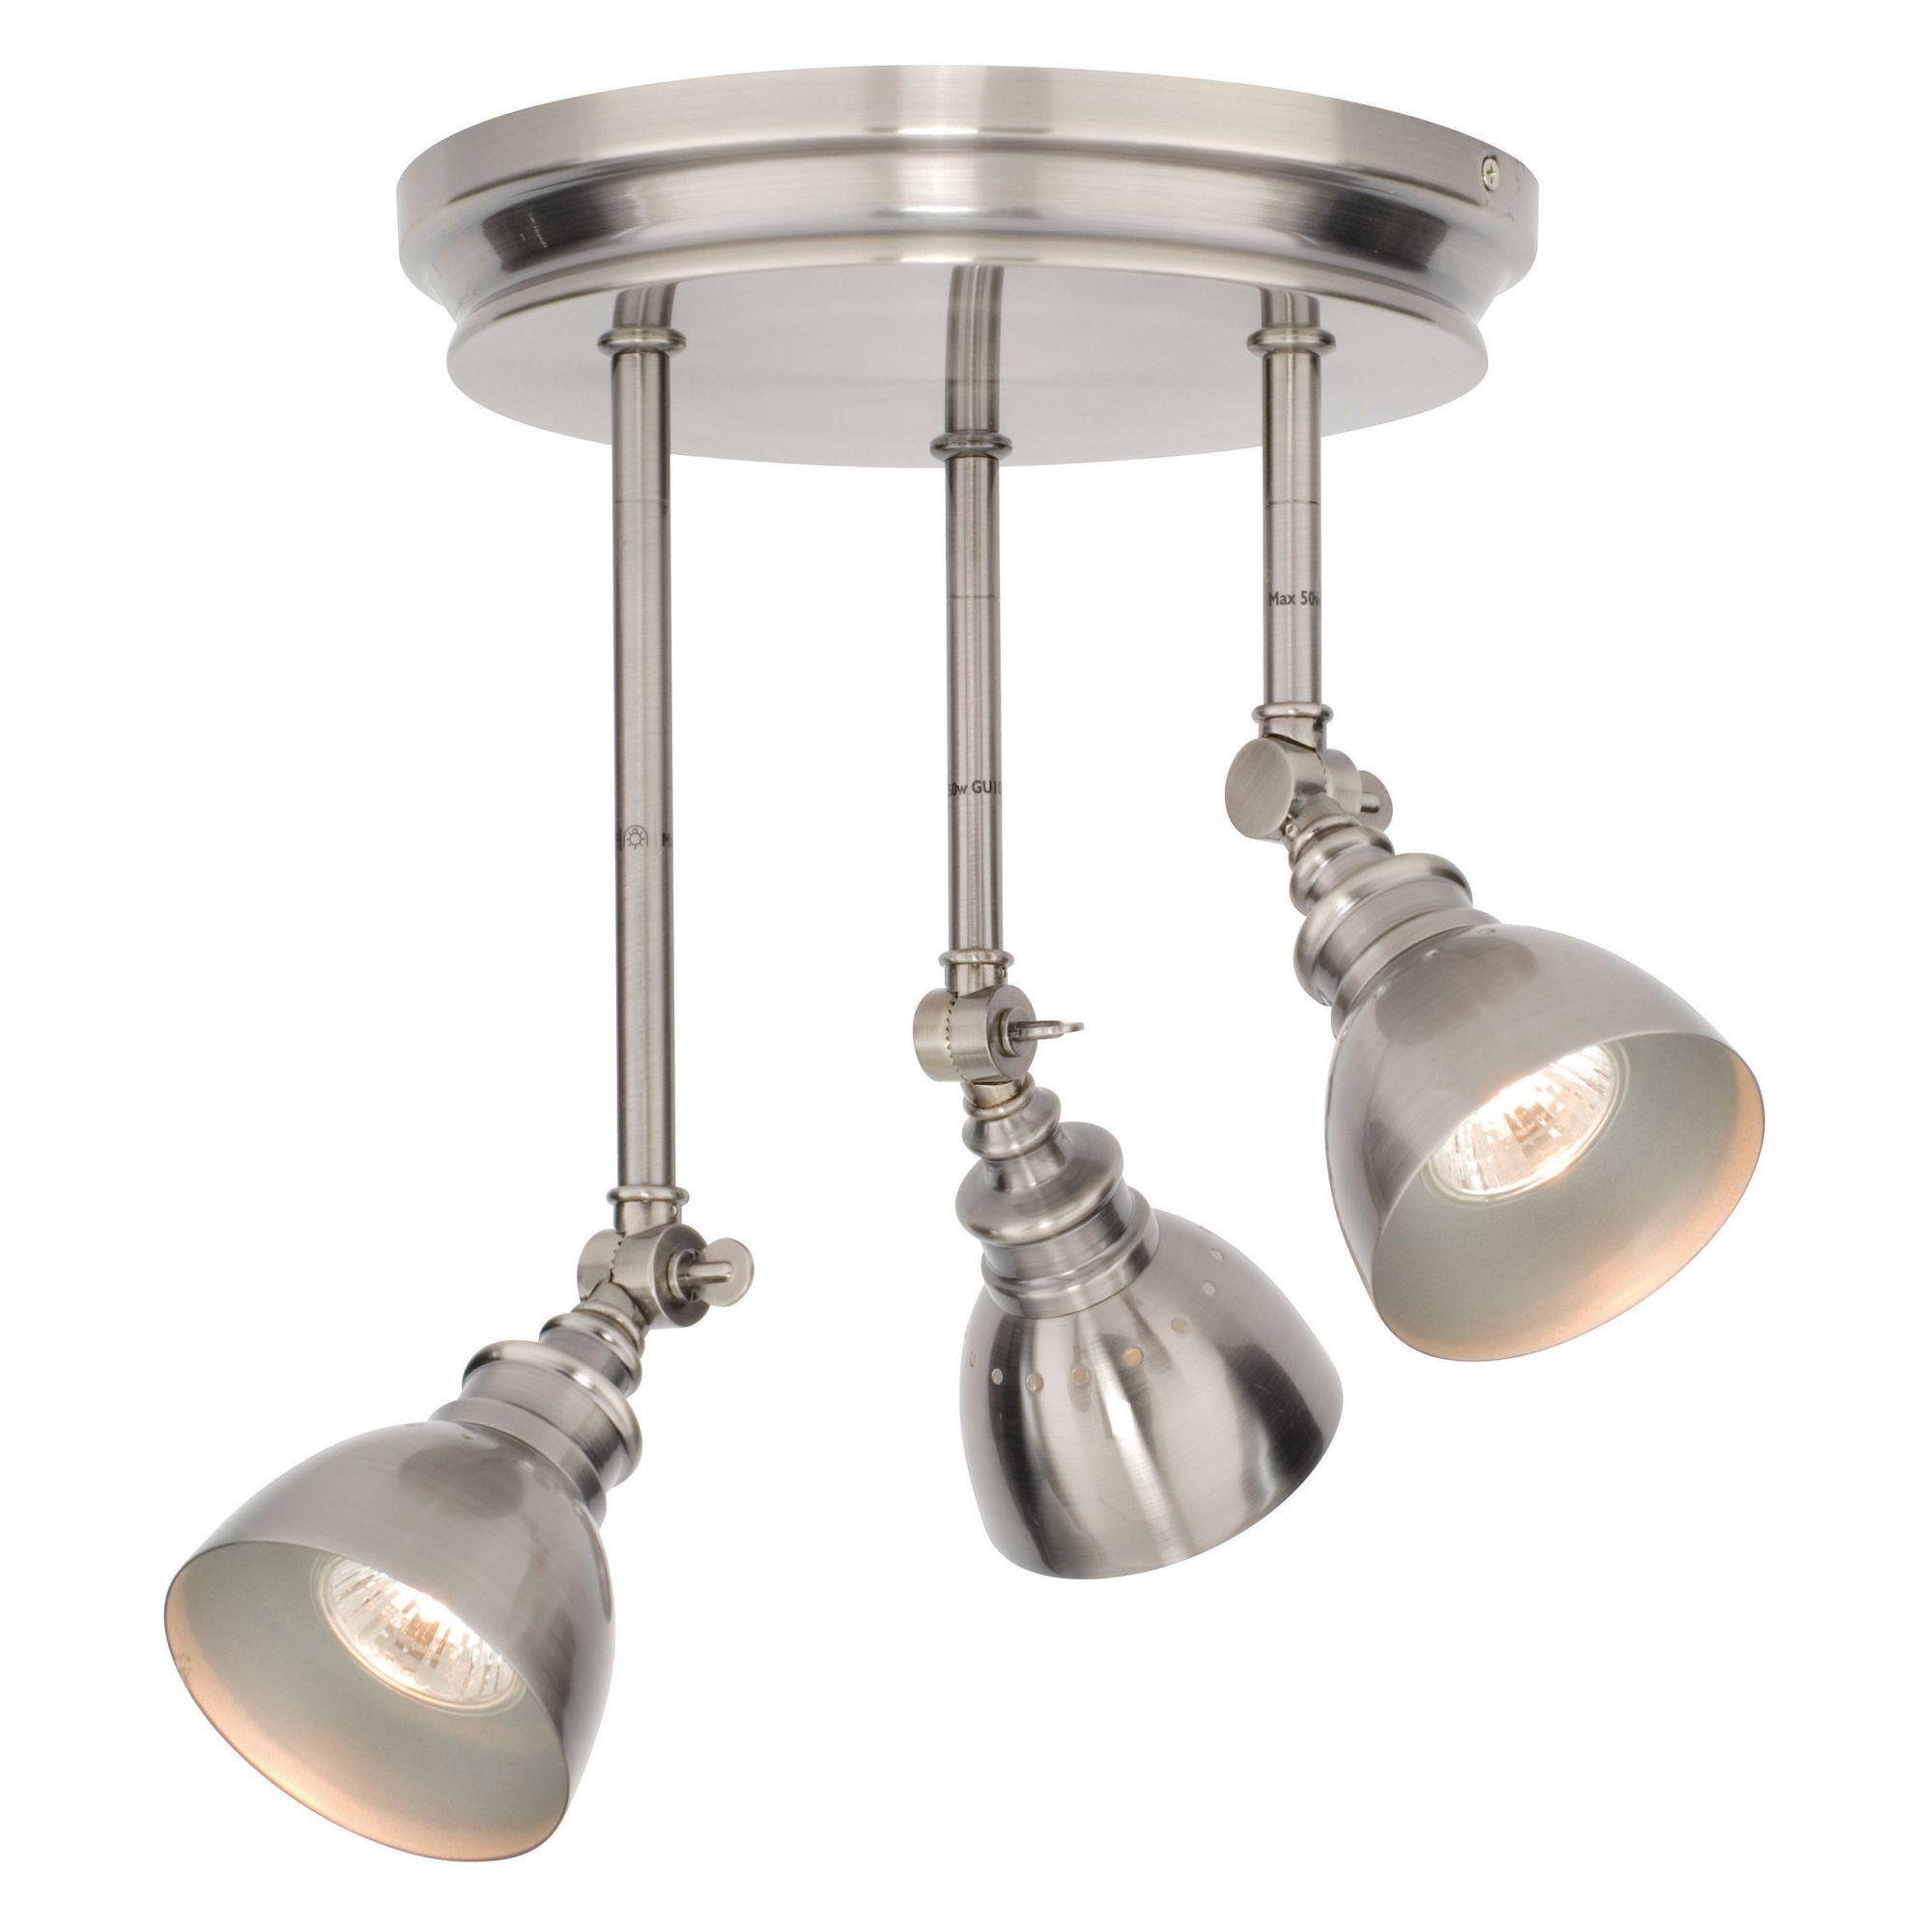 Penn Modern Nickel Effect 3 Lamp Spotlight